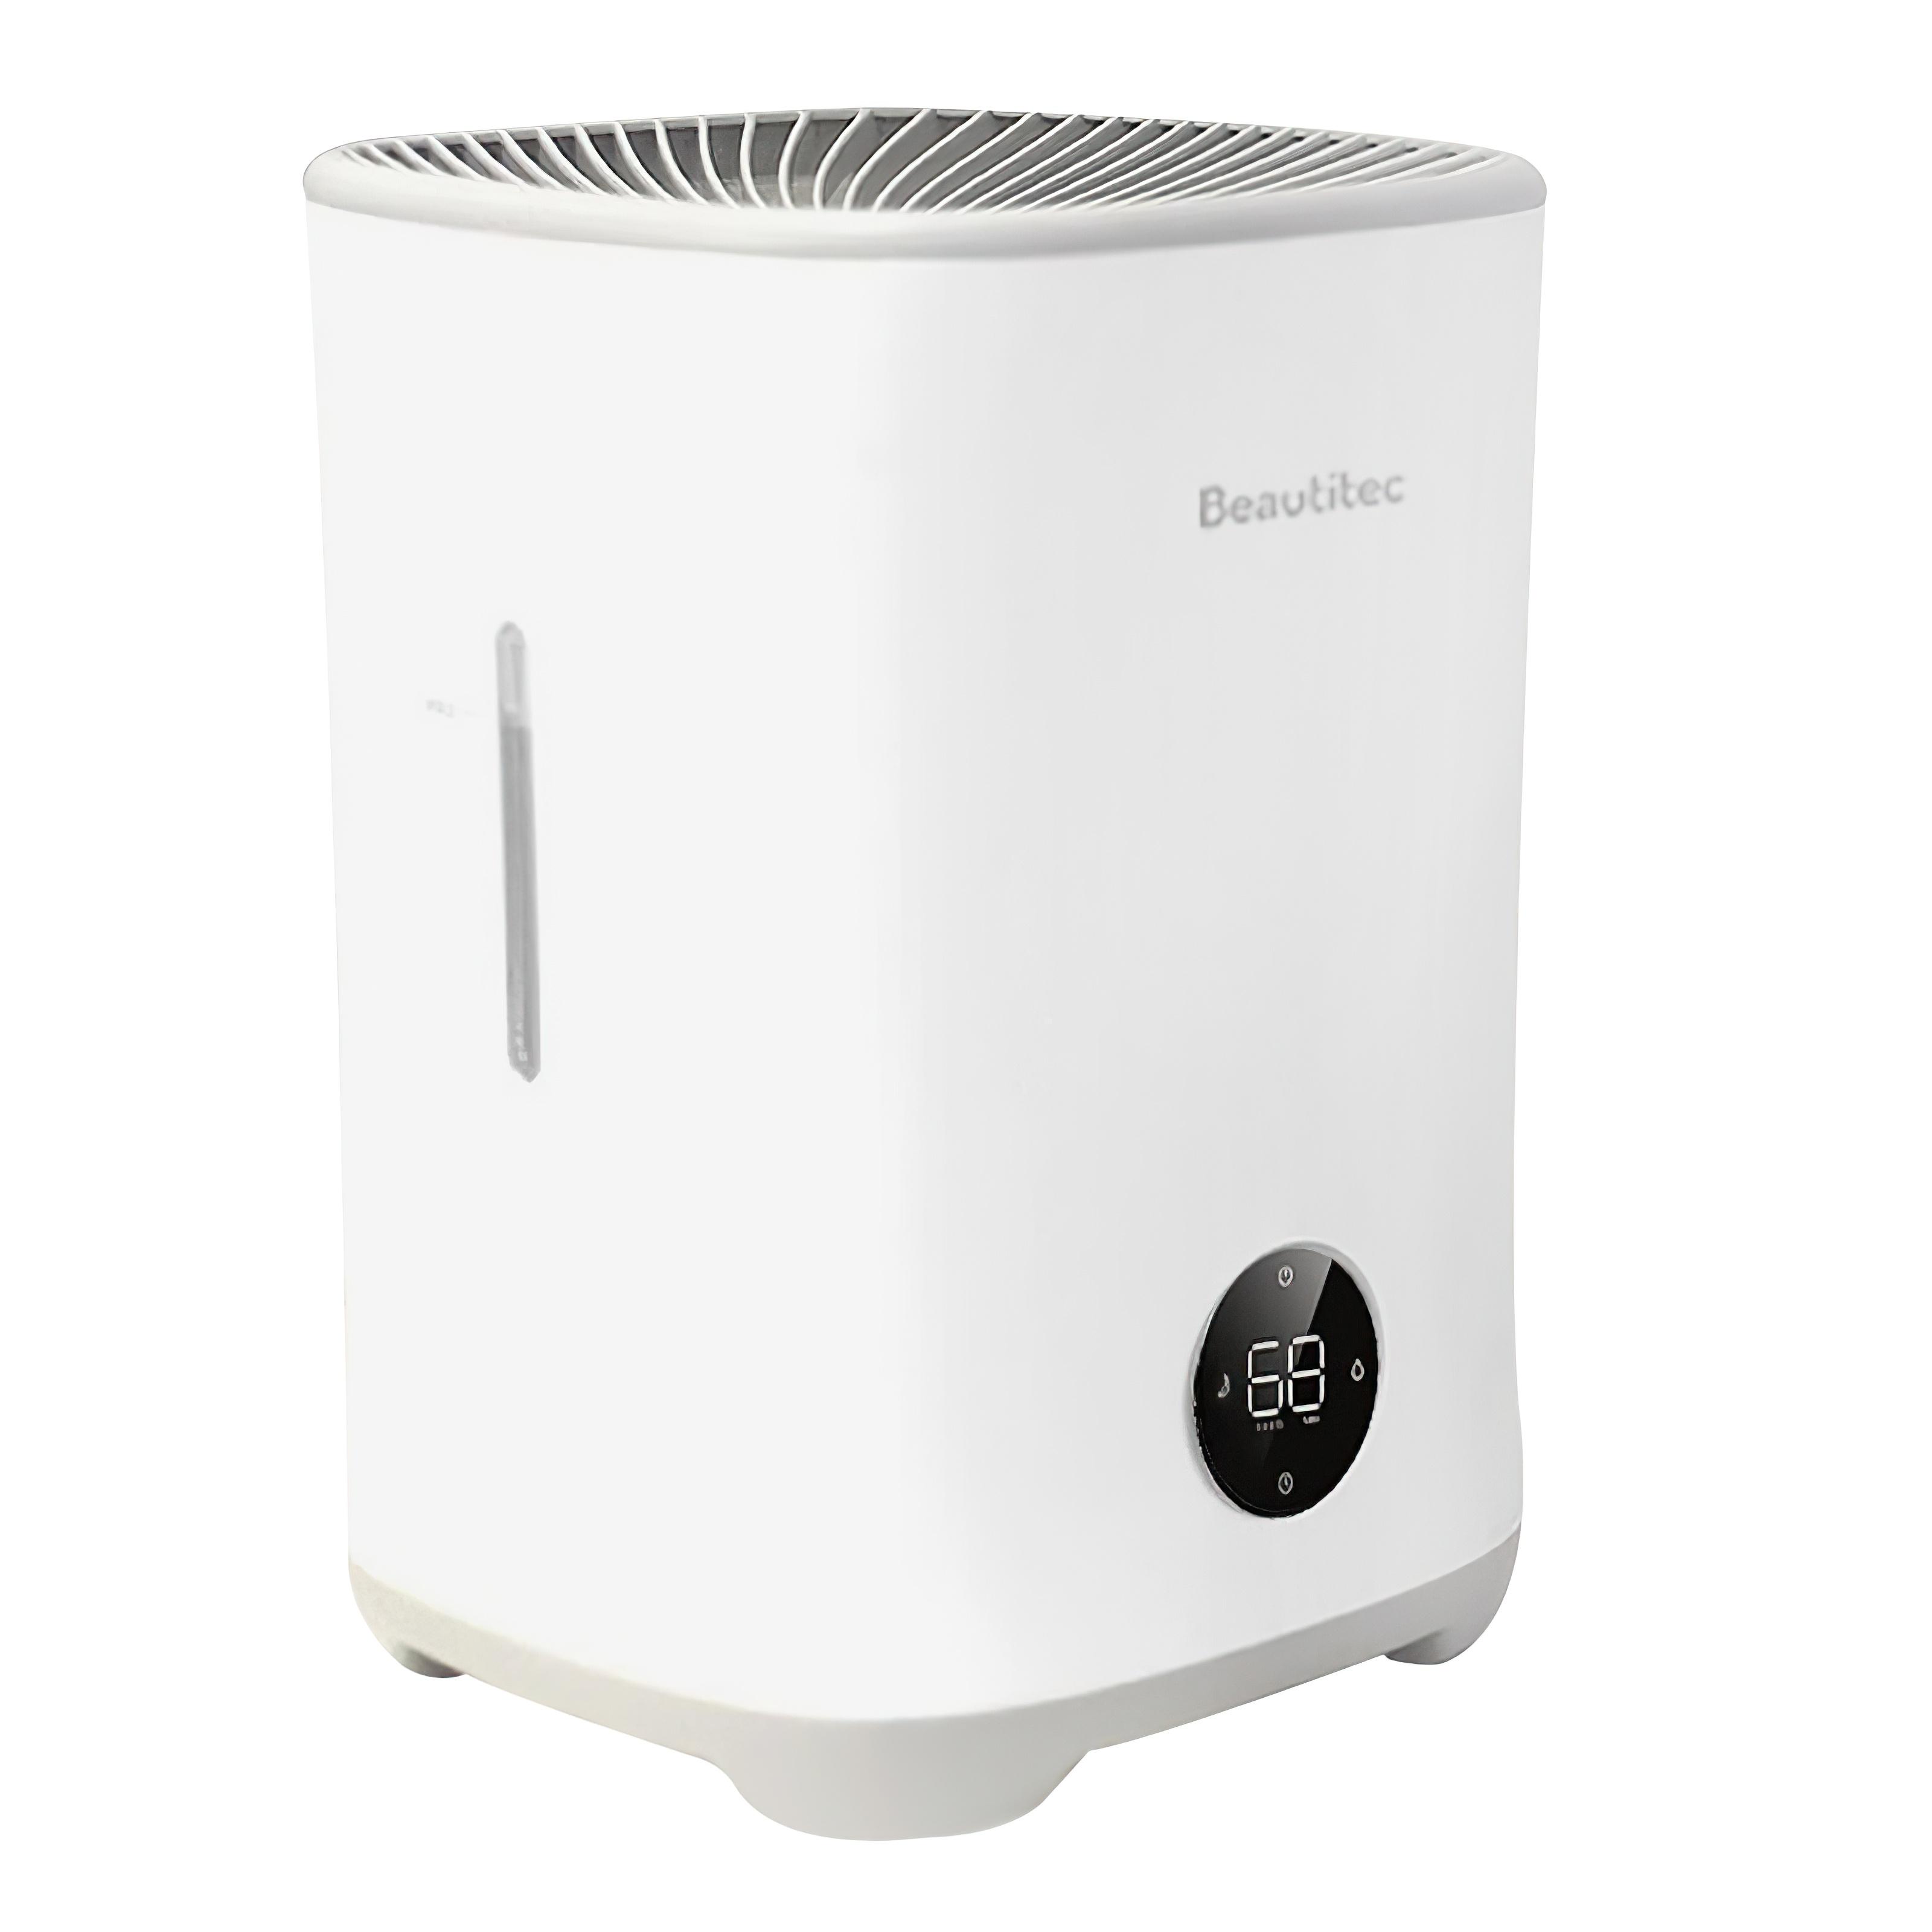 Xiaomi Beautitec Evaporative Humidifier 3L (SZK-A300) КАРКАМ